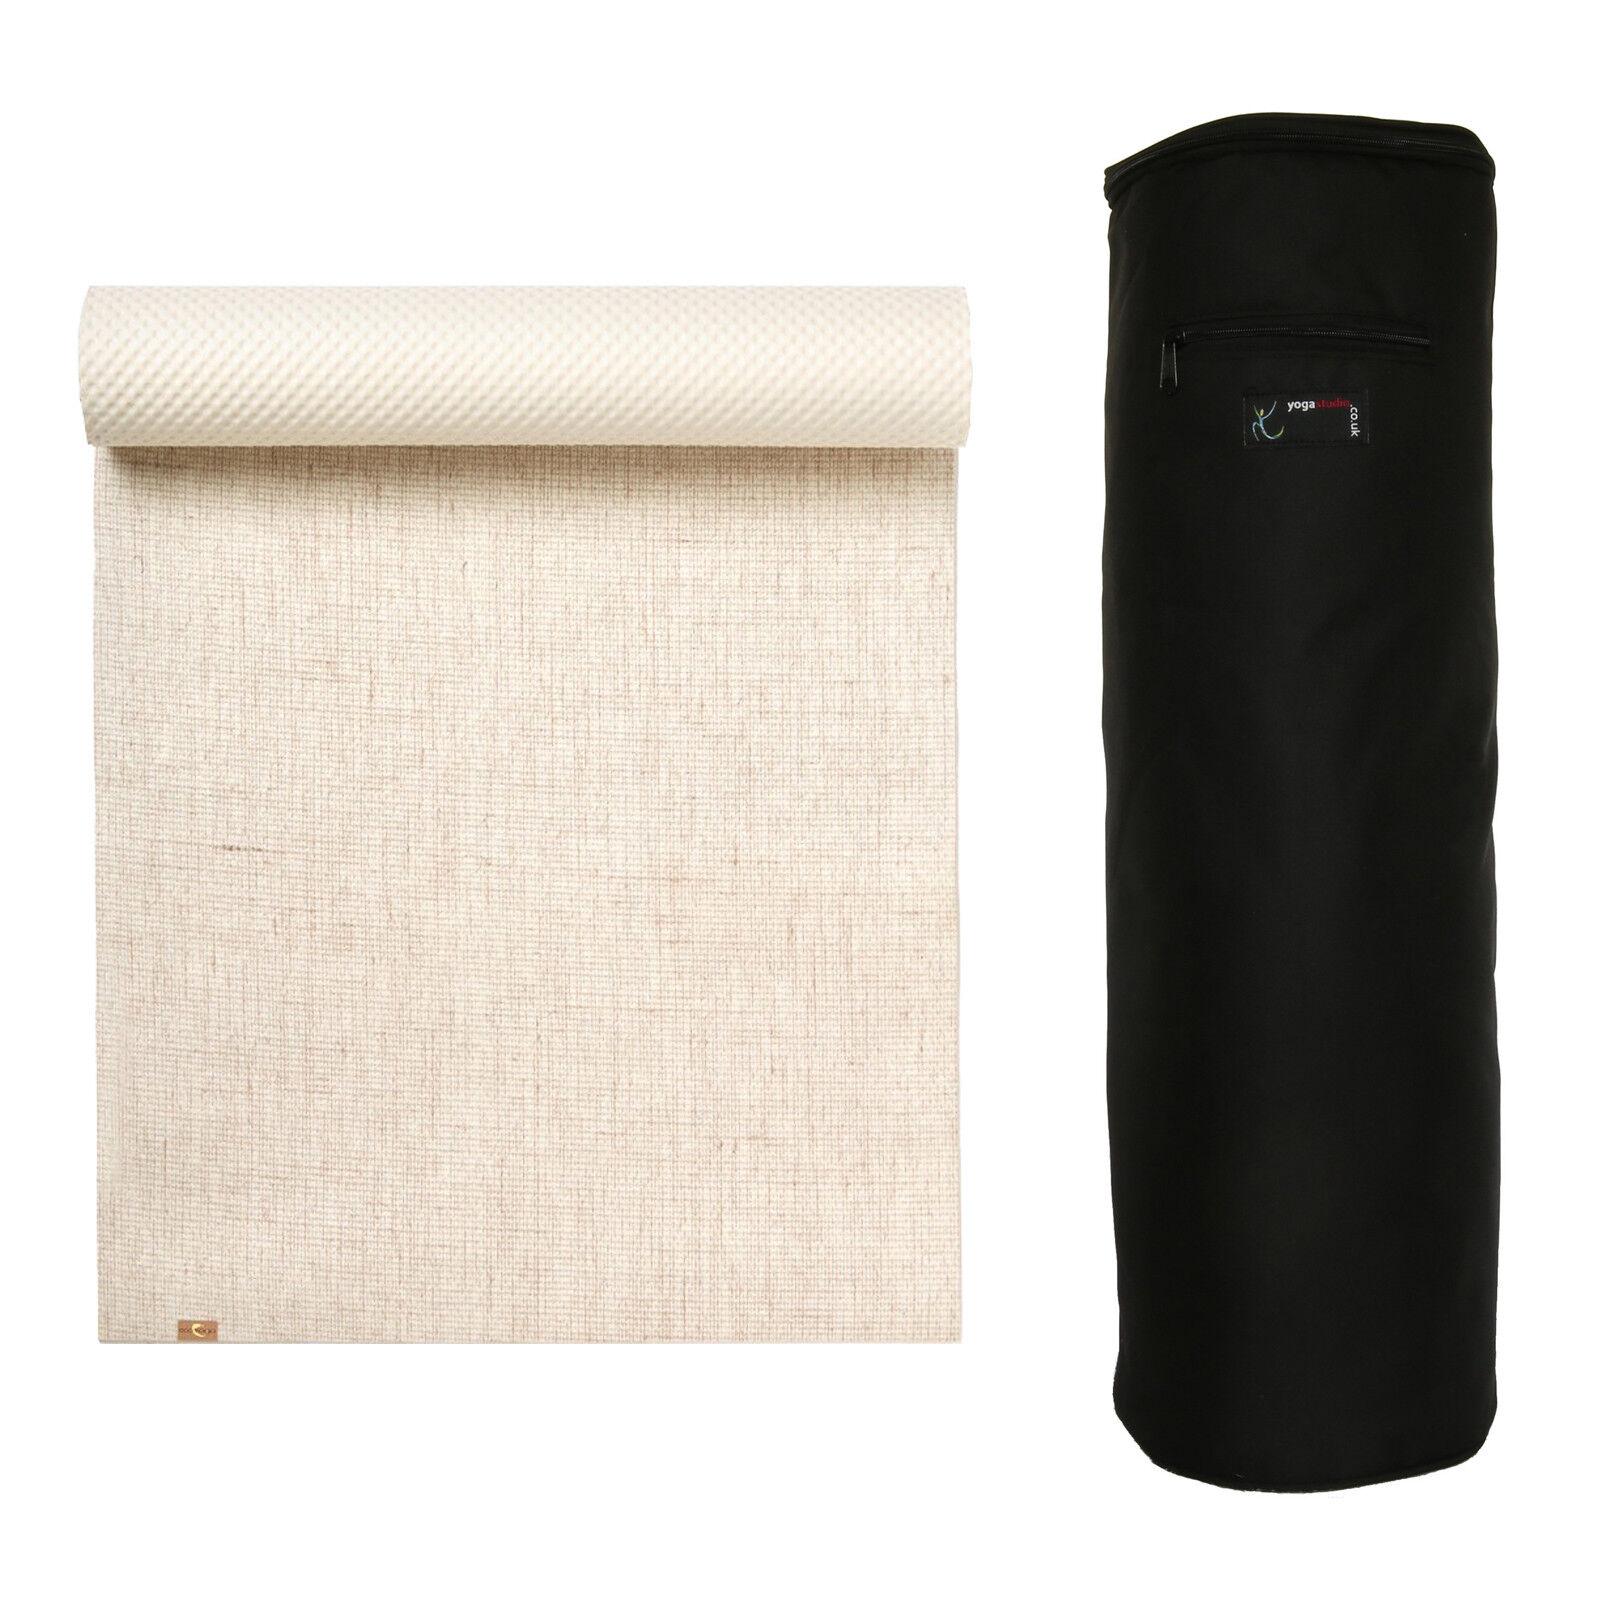 Yoga Studio - EcoYoga Kit Yoga Mat & Bag Combo Set - Various Colours Available